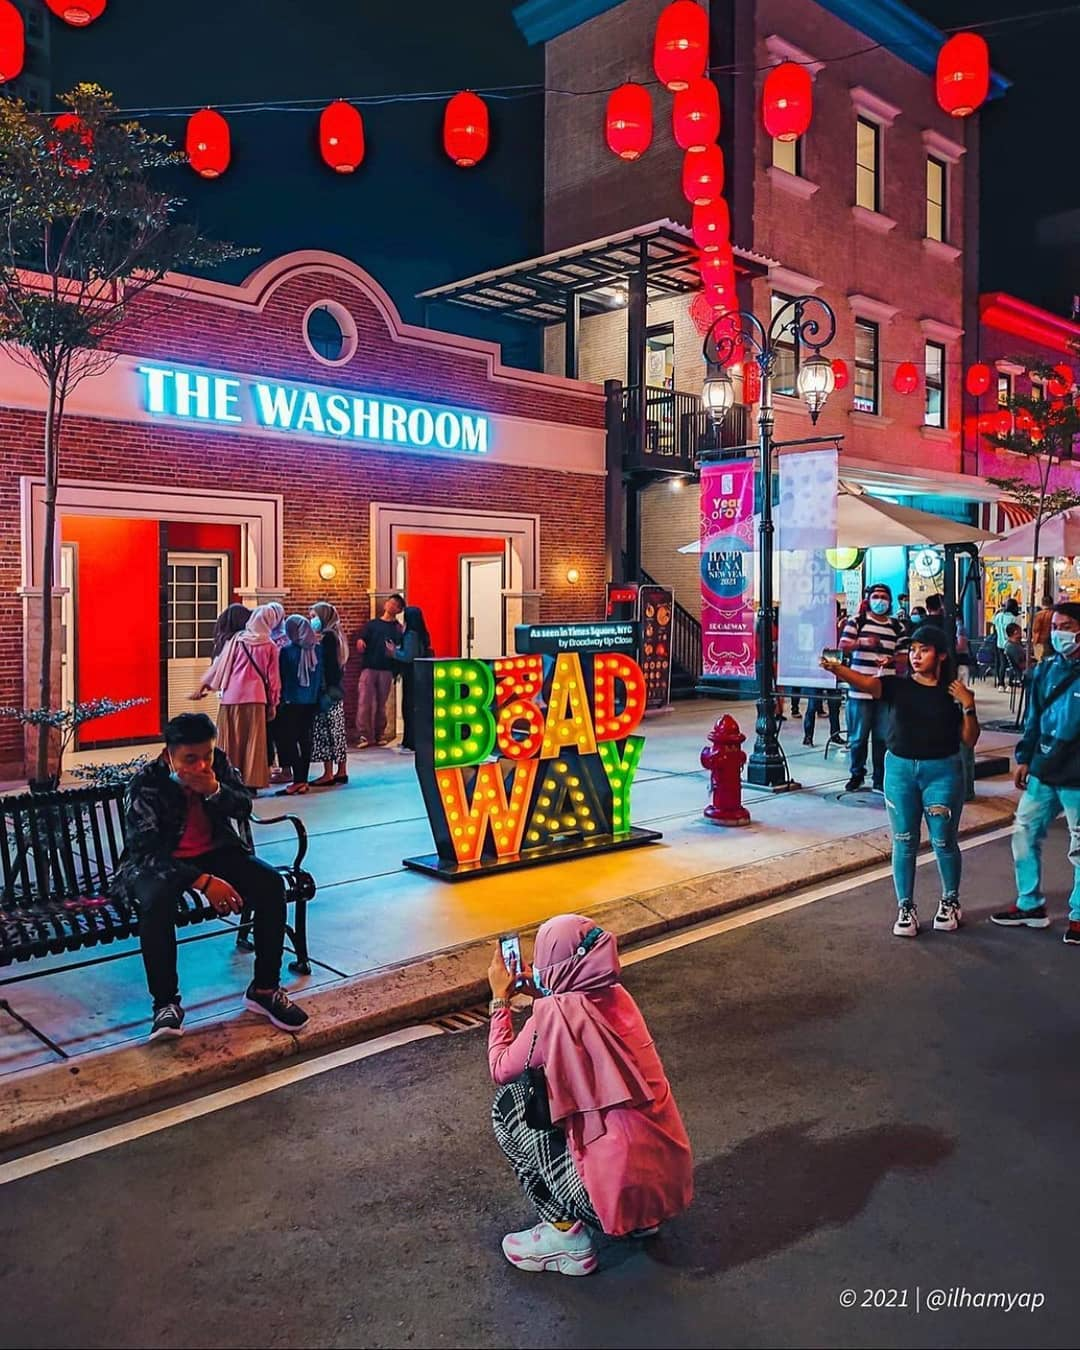 Suasana Pengunjung Di Broadway Alam Sutera Tanggerang Image From @duniatangerang